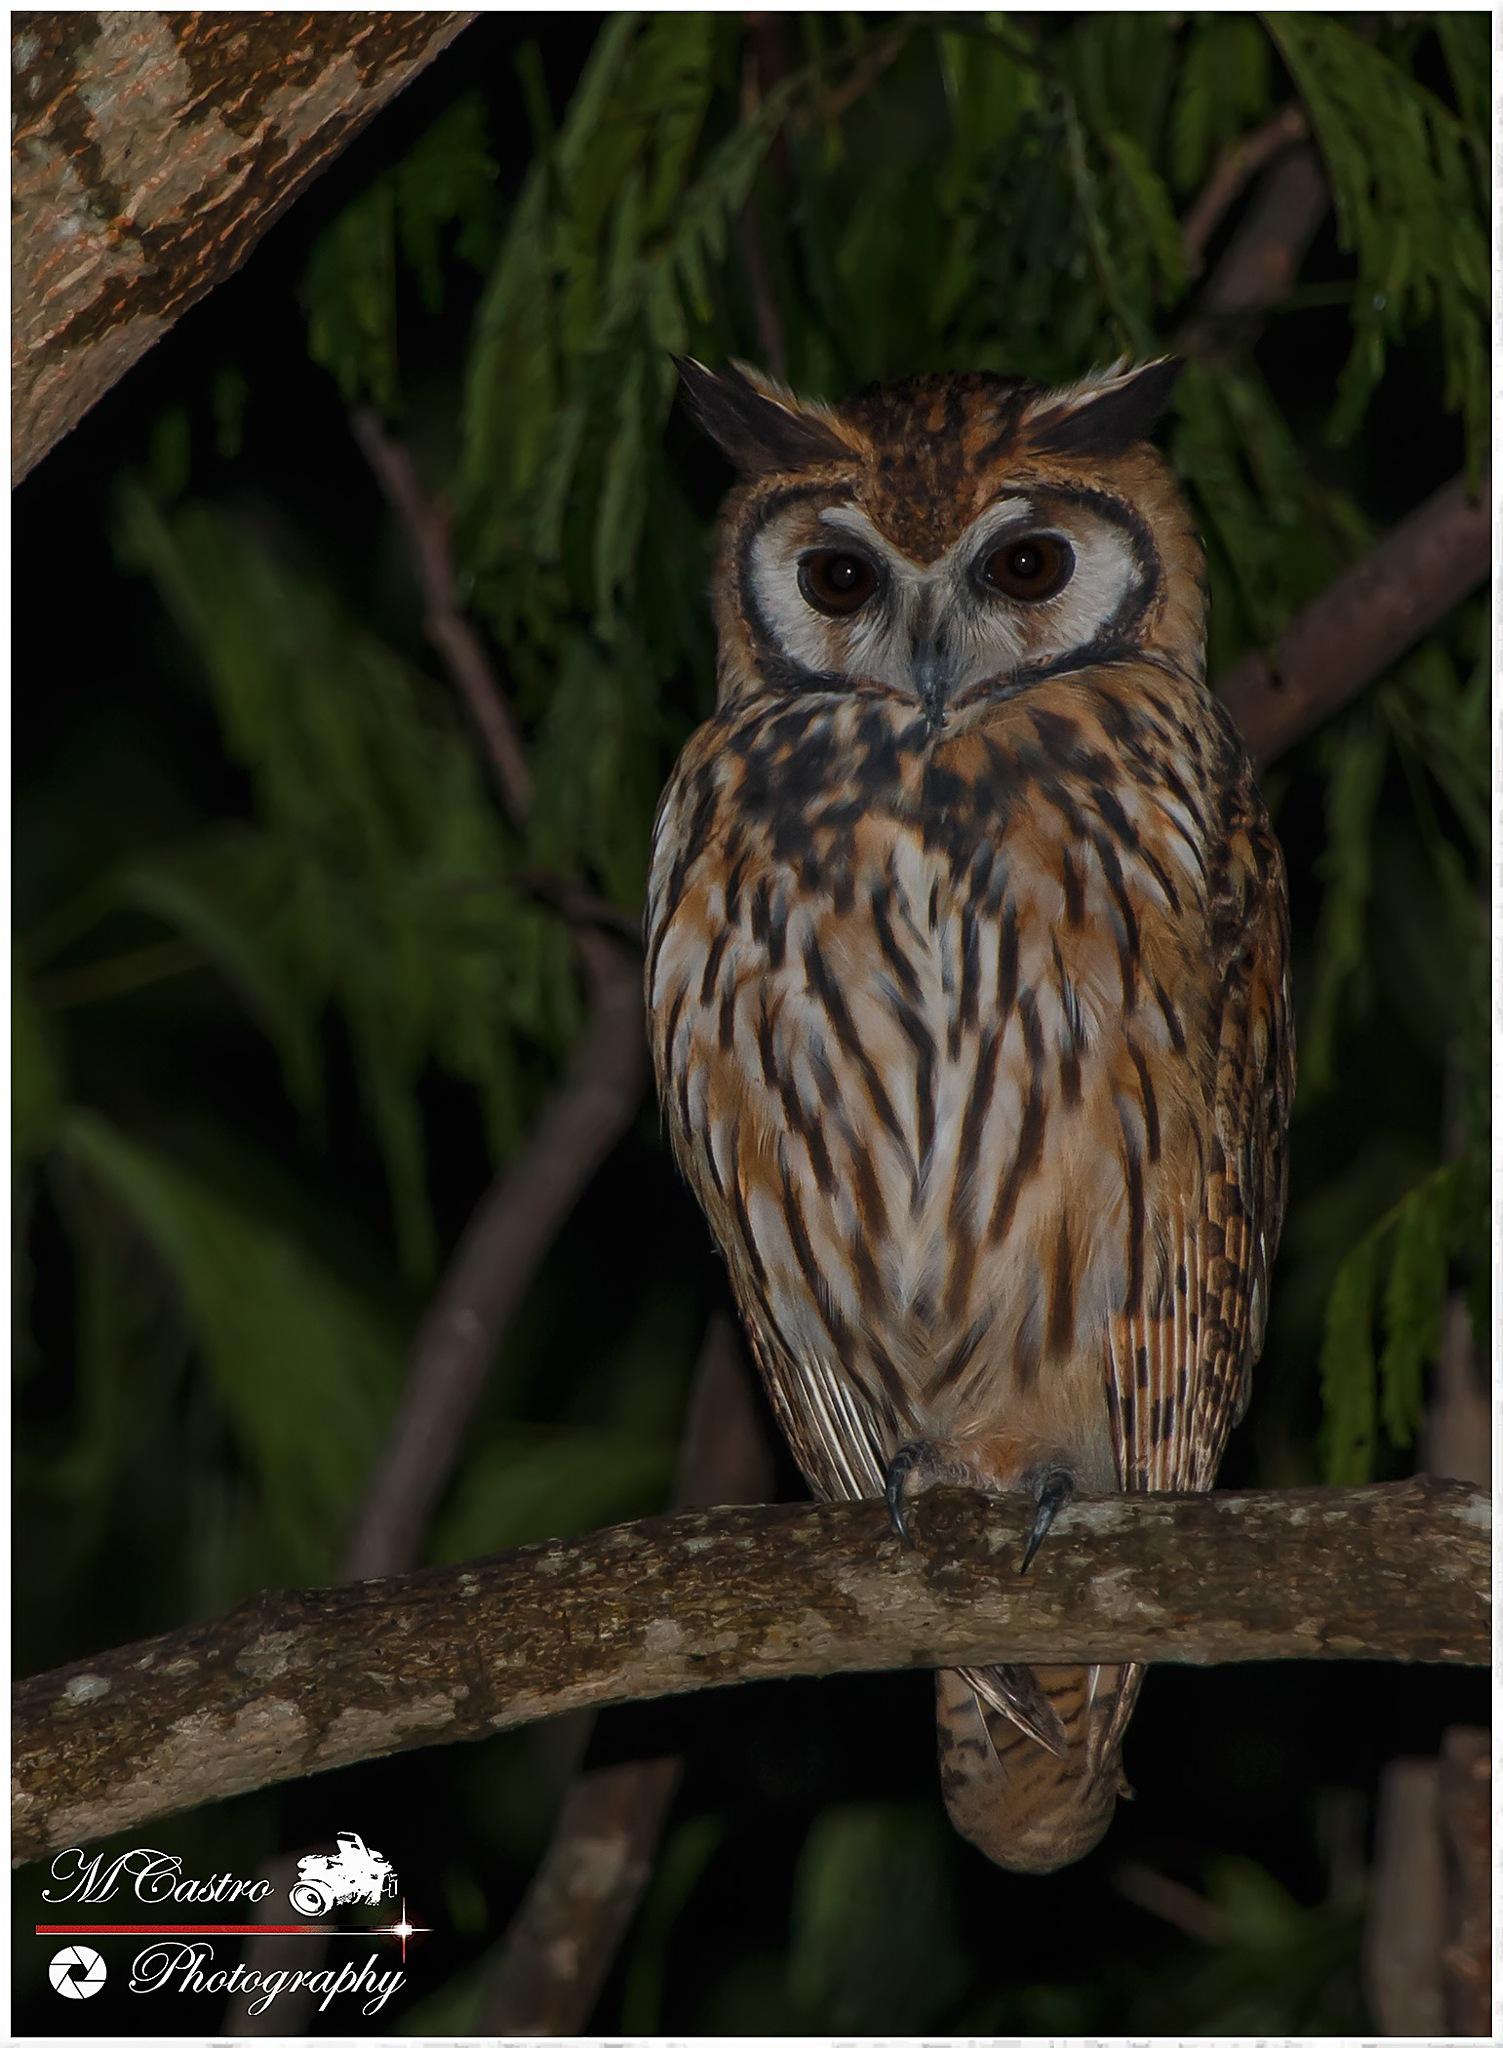 Striped Owl by Marco V. Castro